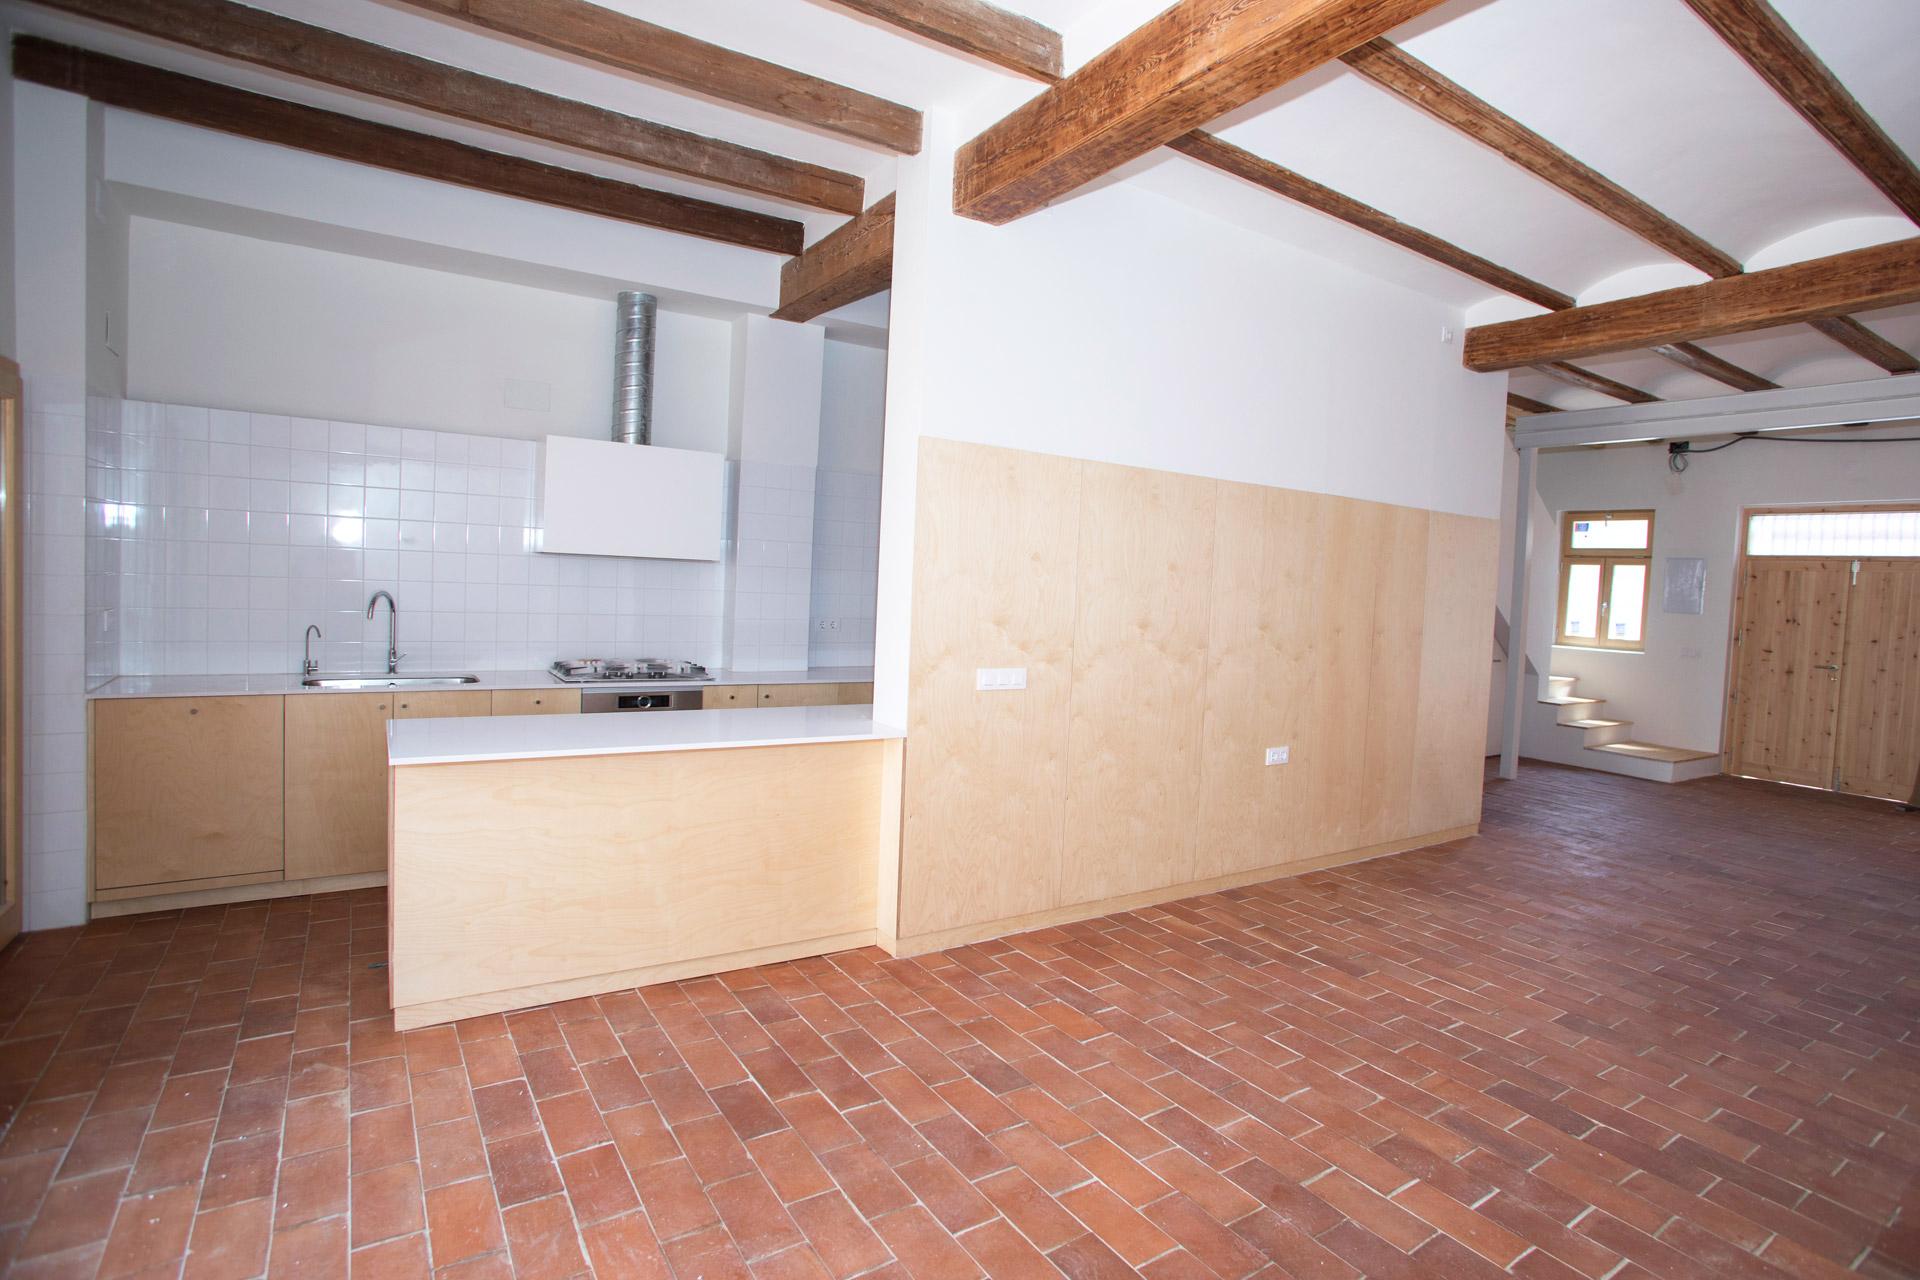 rehabilitacion integral viviendas valencia 2